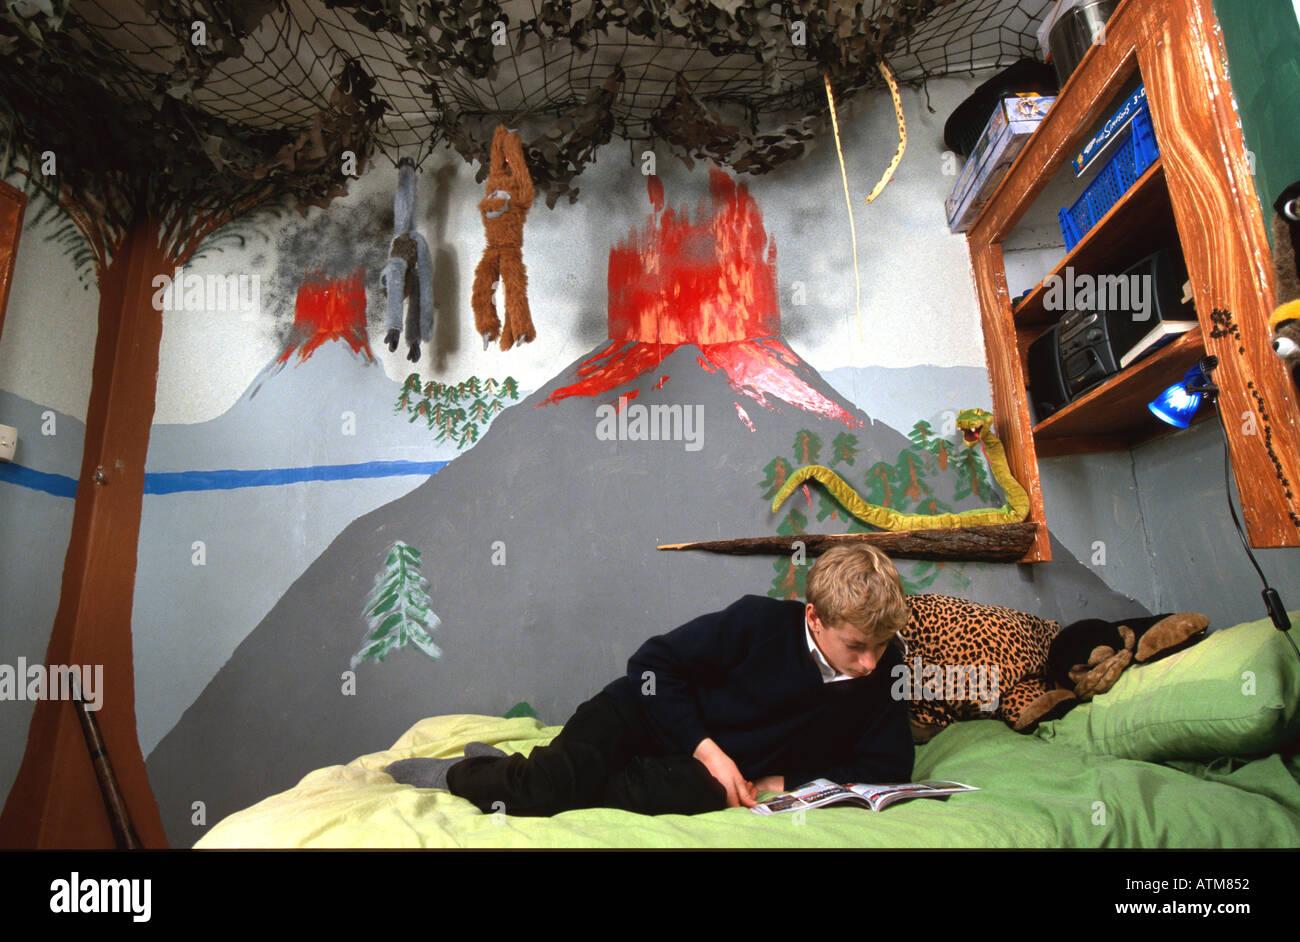 Boy Reading In Hammock In Jungle Themed Bedroom Luke Hanna Stock Photo Alamy